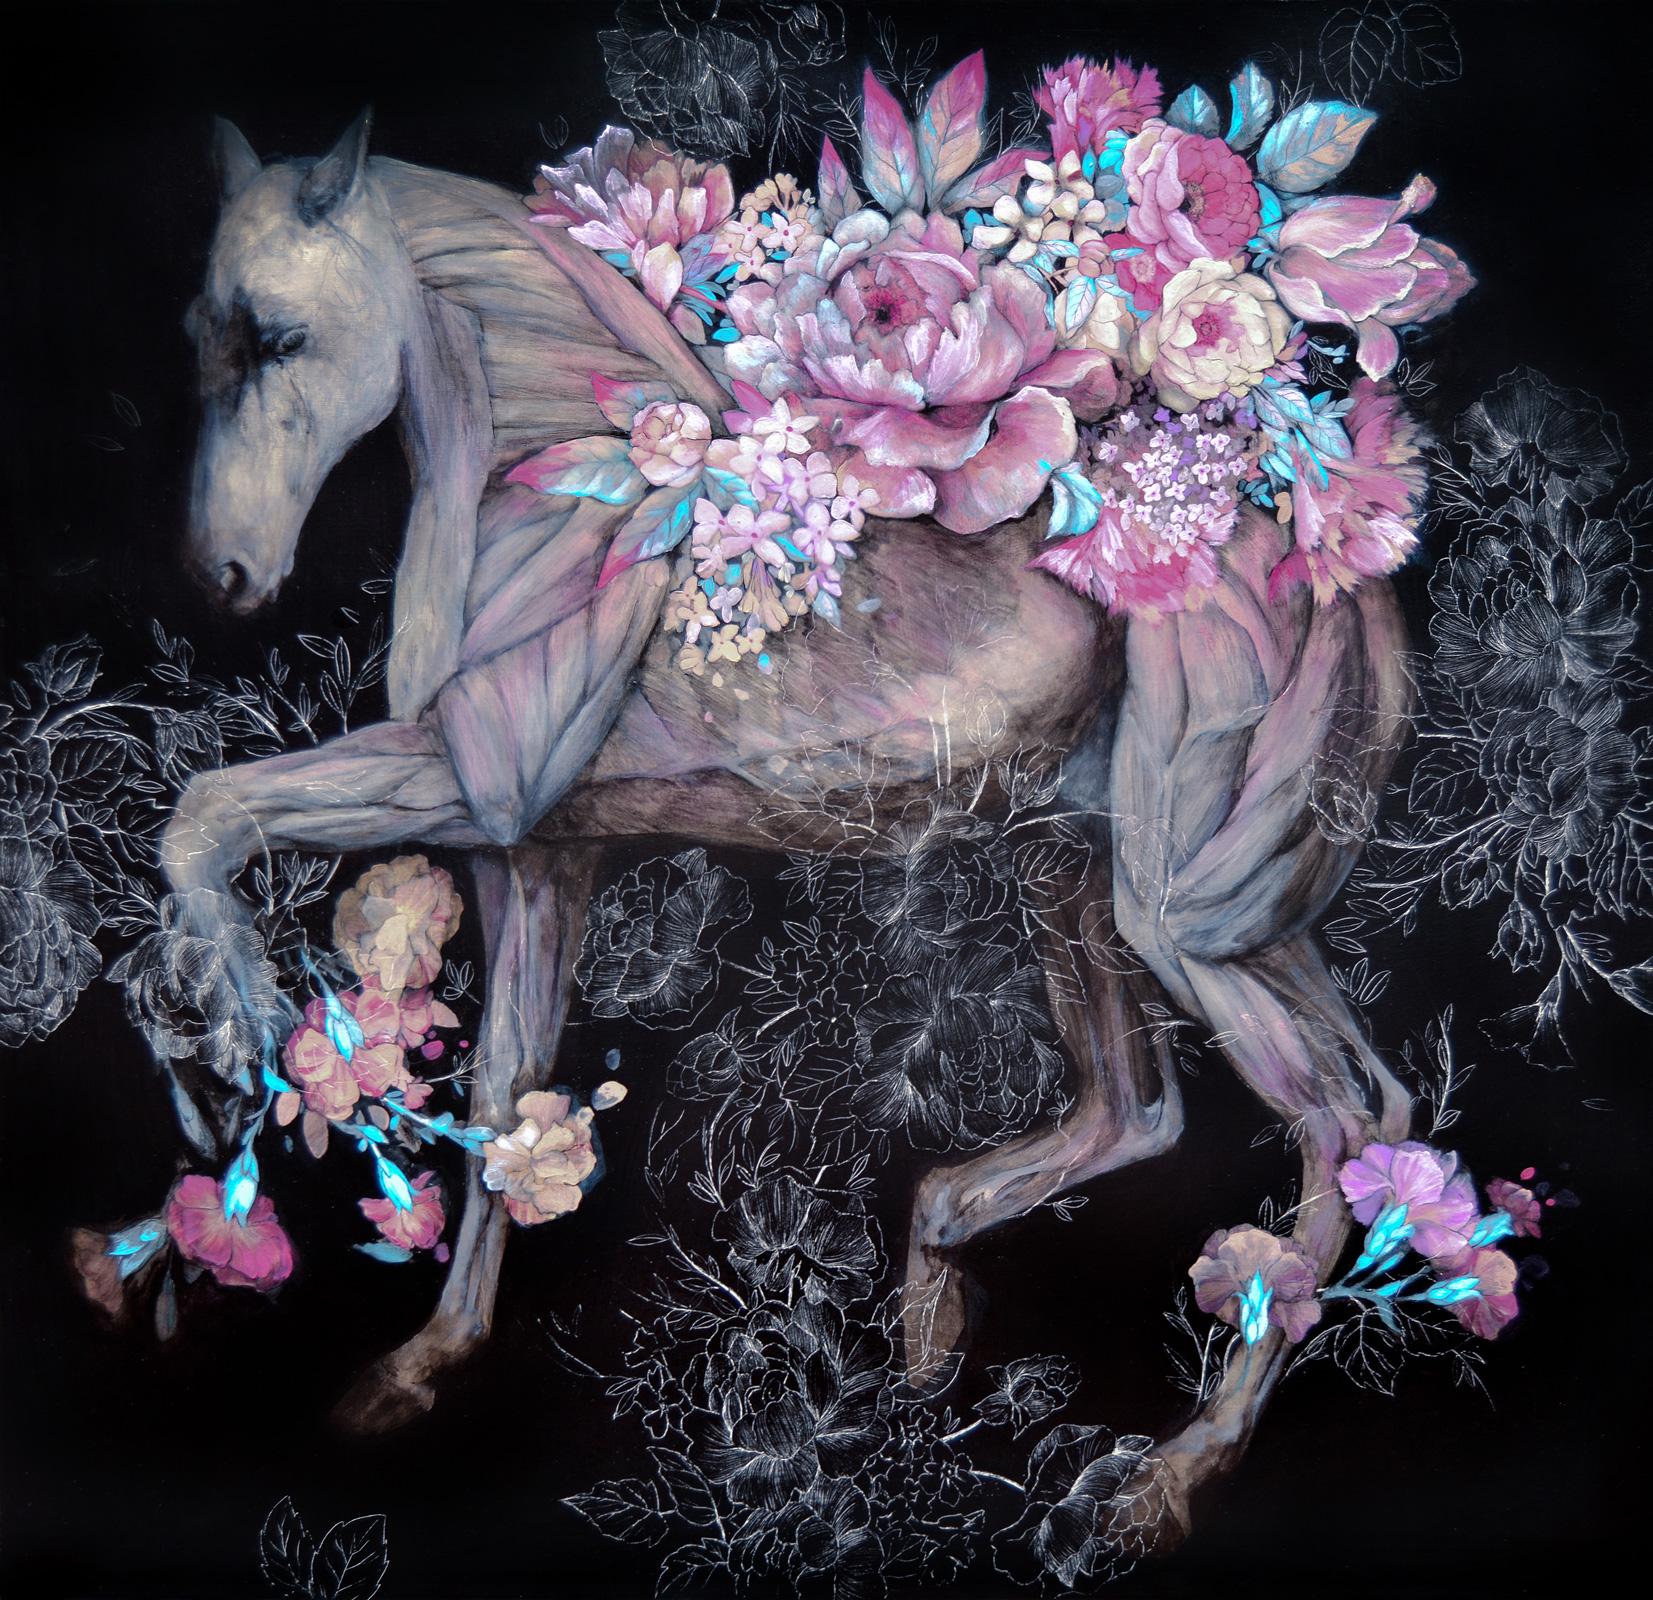 Nunzio Paci - Grafted Horse